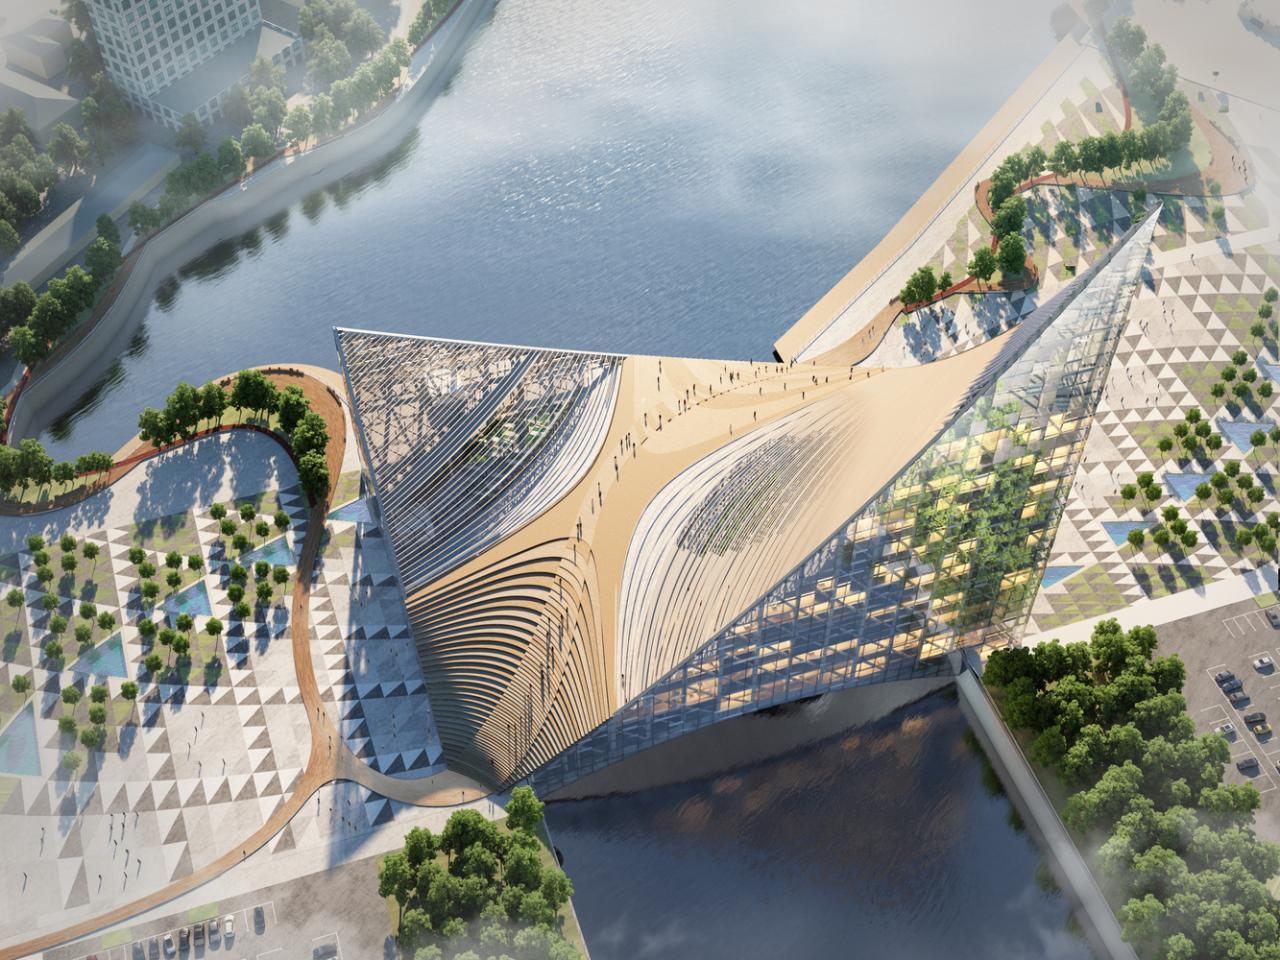 В Челябинске строят мост–небоскреб Всячина